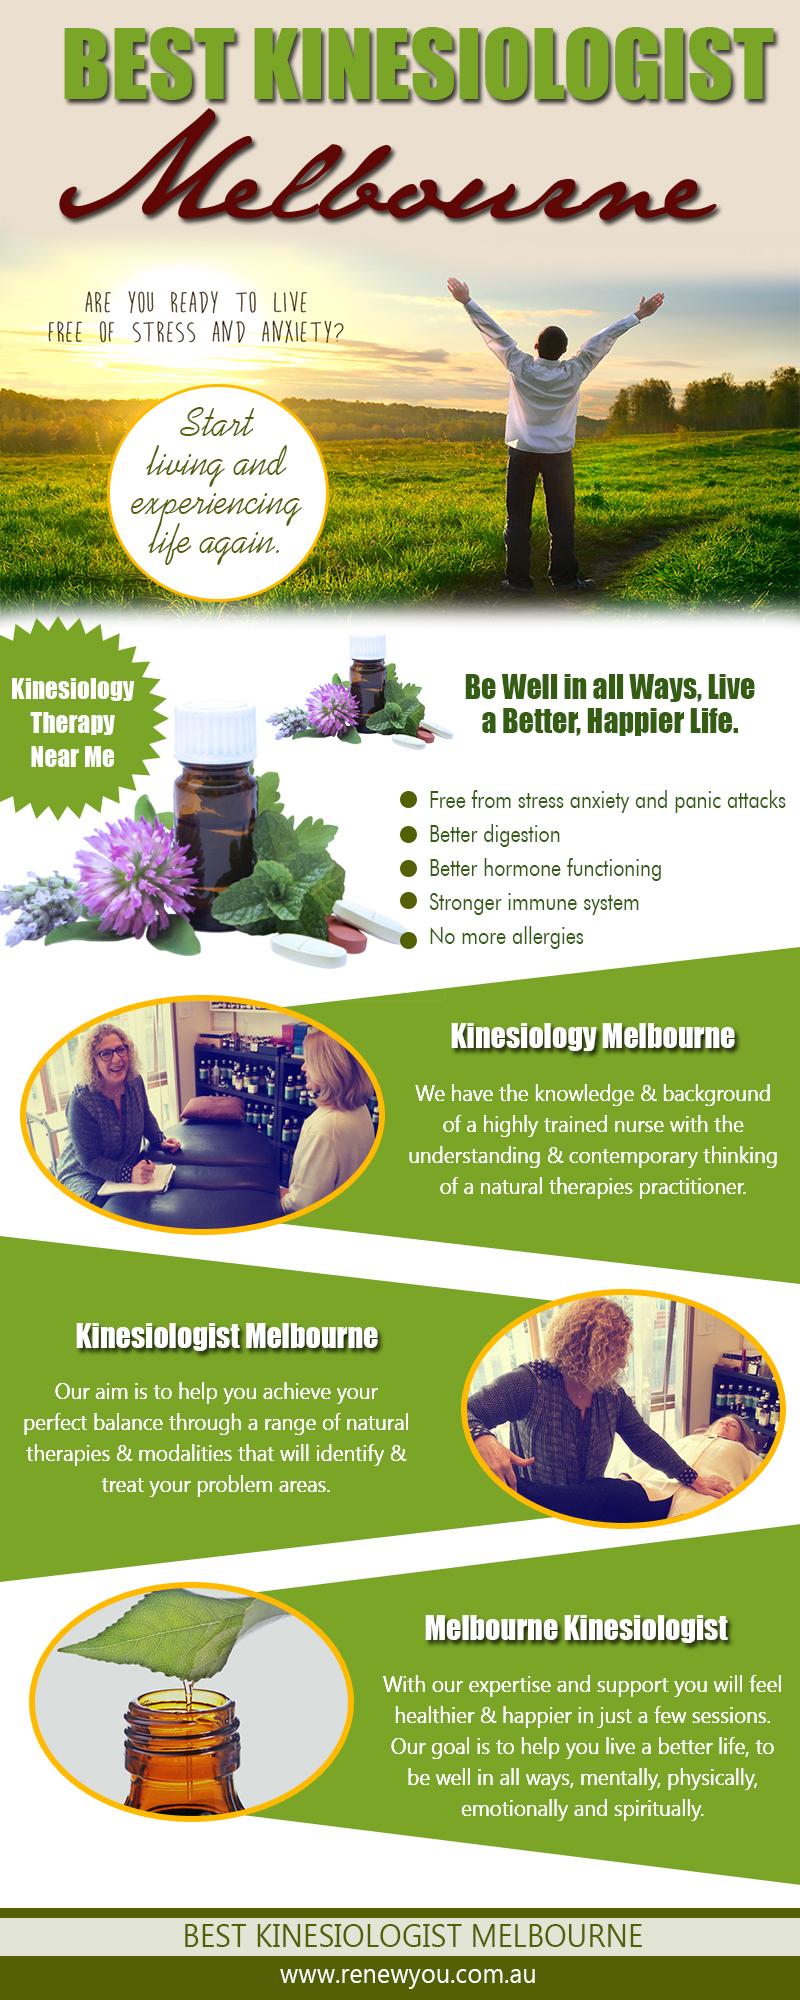 Best Kinesiologist Melbourne.jpg